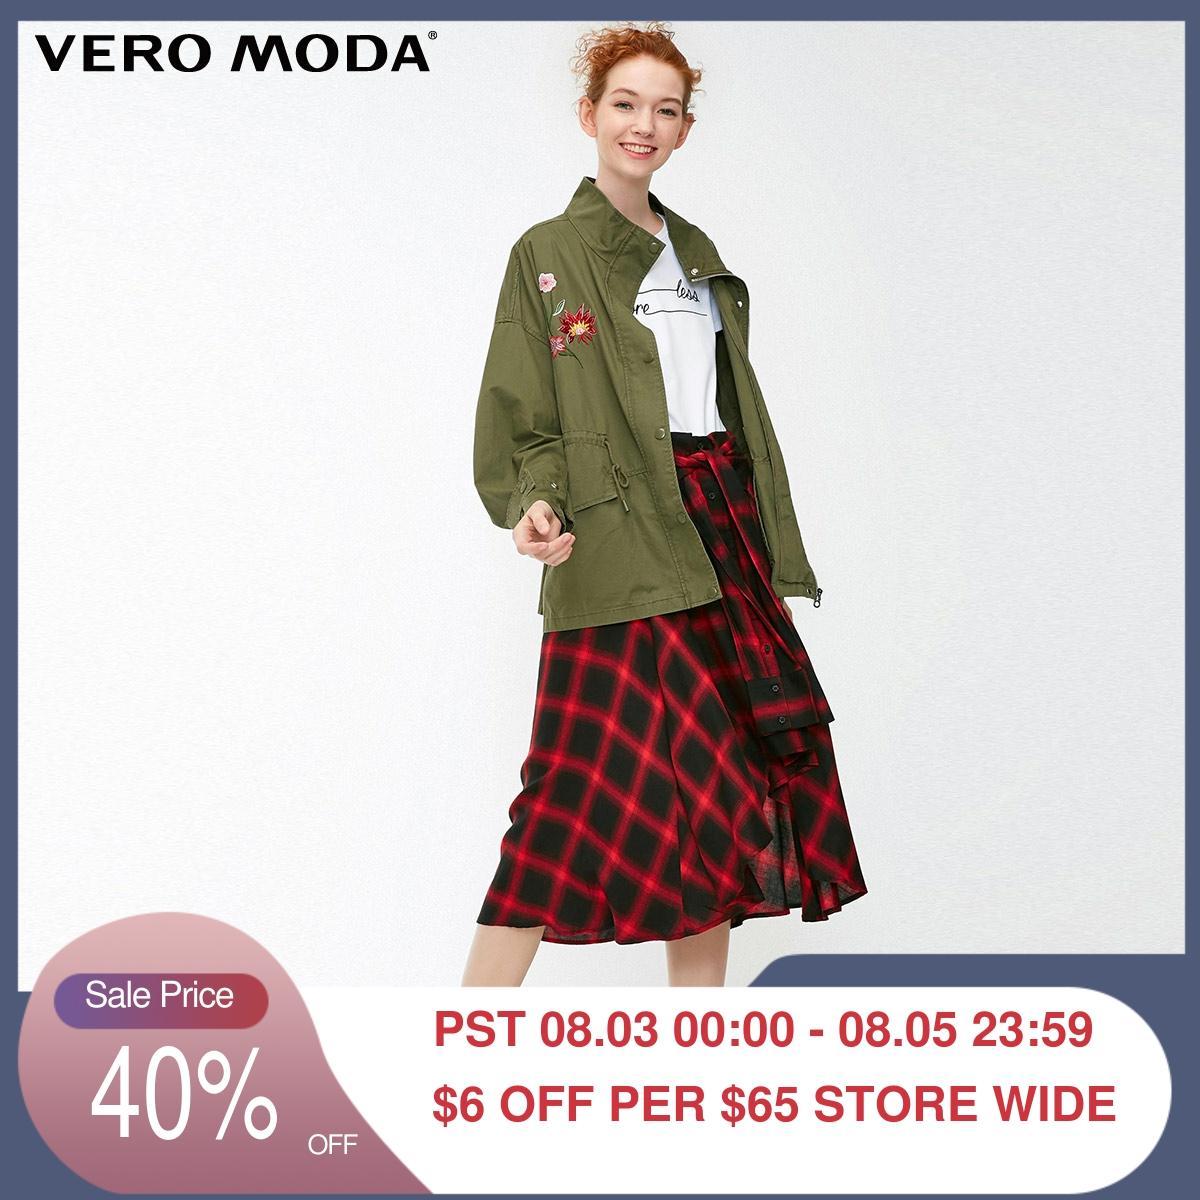 Vero moda Novo Estilo Militar das Mulheres Bordado Floral Cordão Cintura Zipado Jaqueta Pescoço Mock   318321538